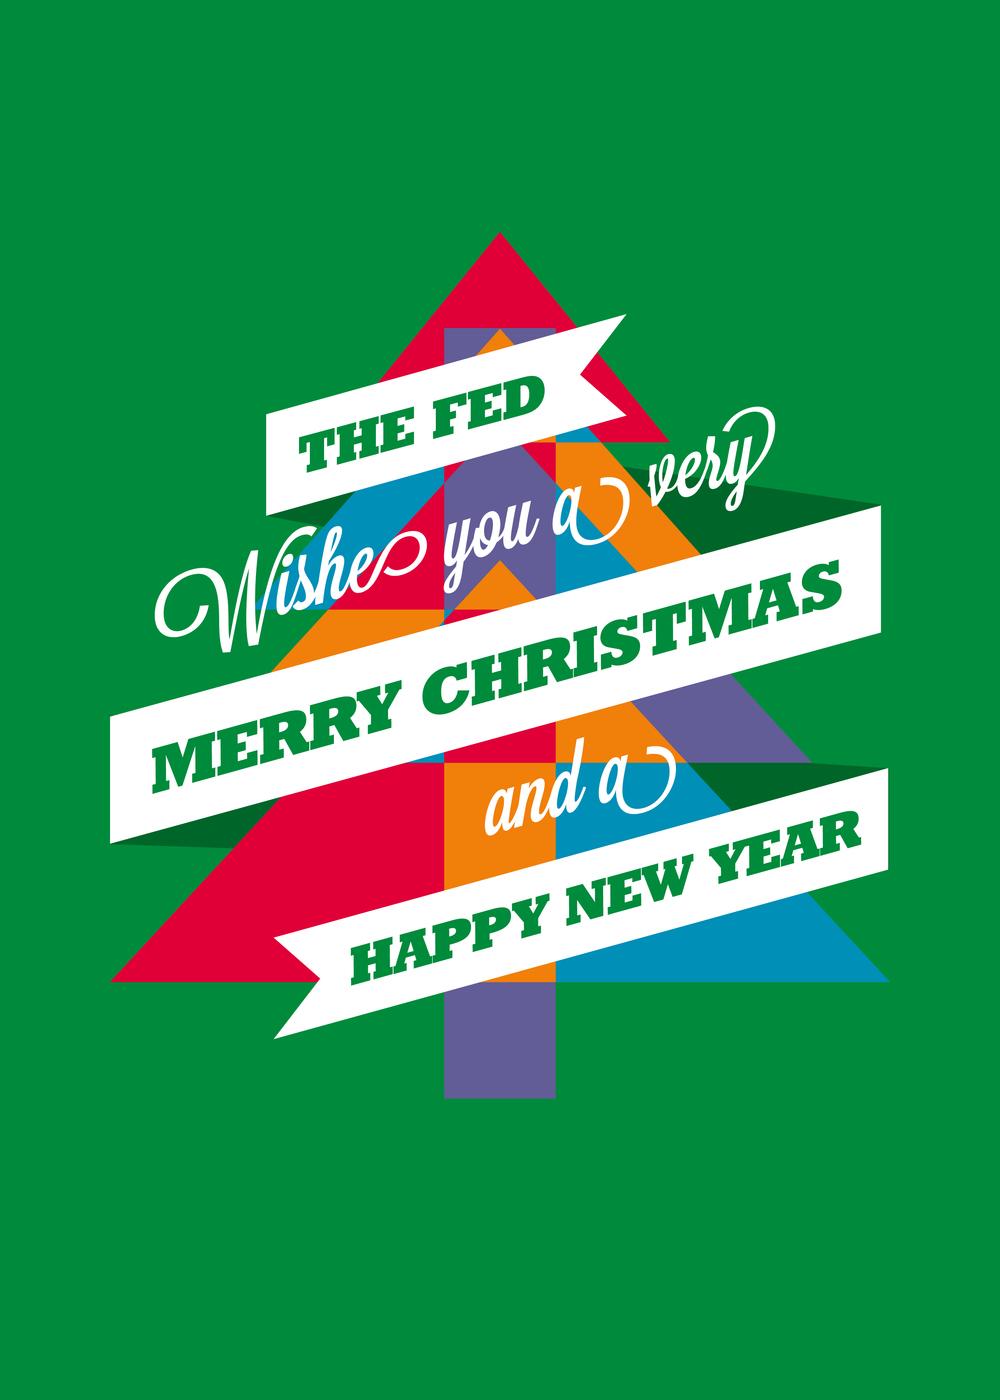 TheFed_ChristmasCard_2013-01.jpg